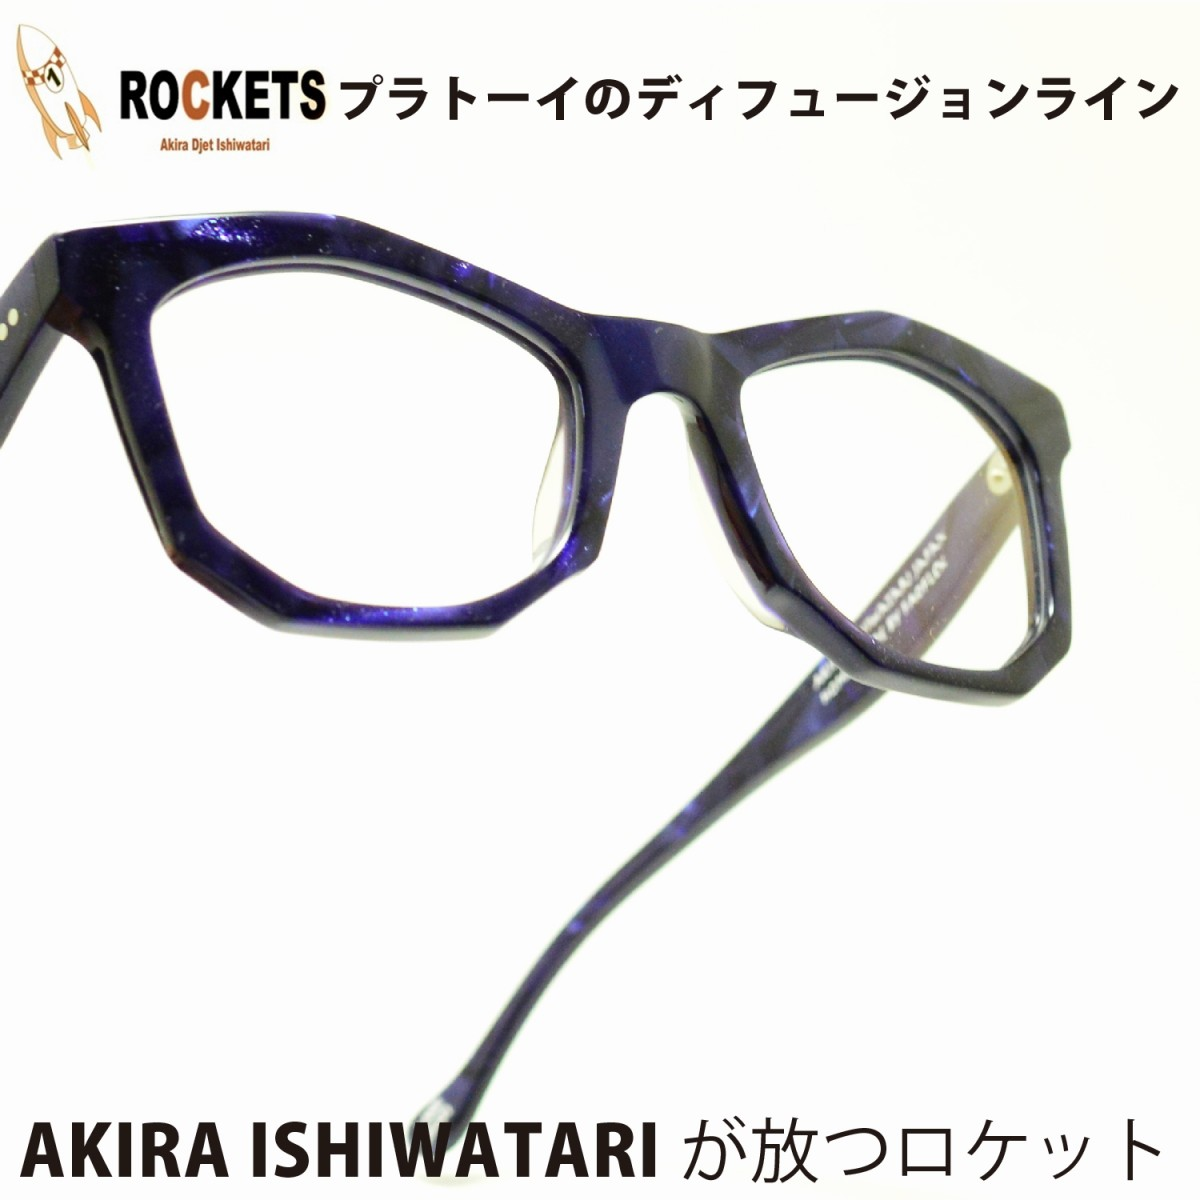 ROCKETS UTSUKE COL-LAKEメガネ 眼鏡 めがね メンズ レディース おしゃれ ブランド 人気 おすすめ フレーム 流行り 度付き レンズ